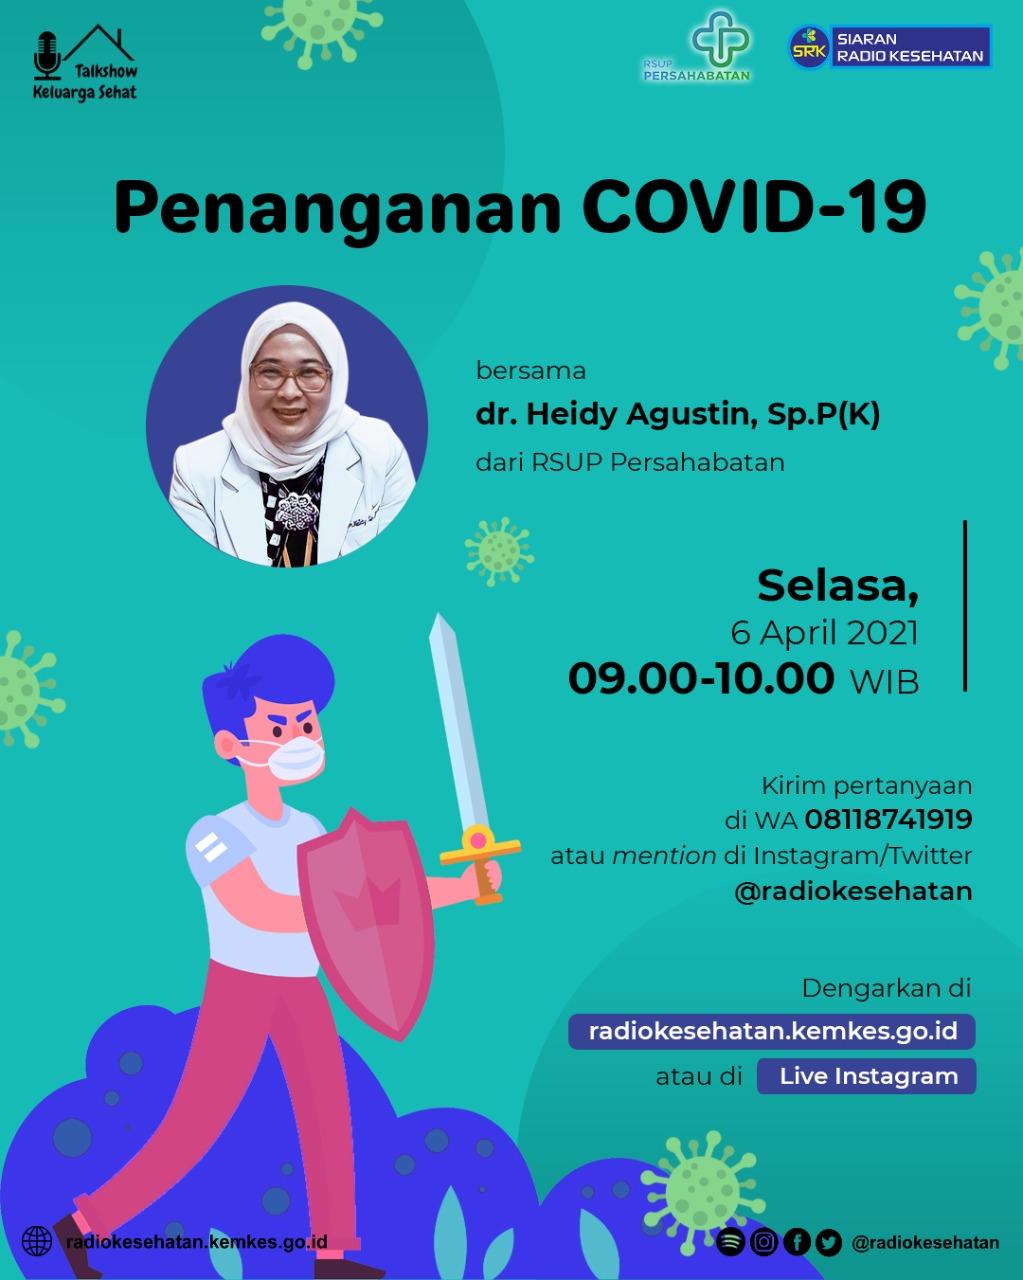 Penanganan Covid-19